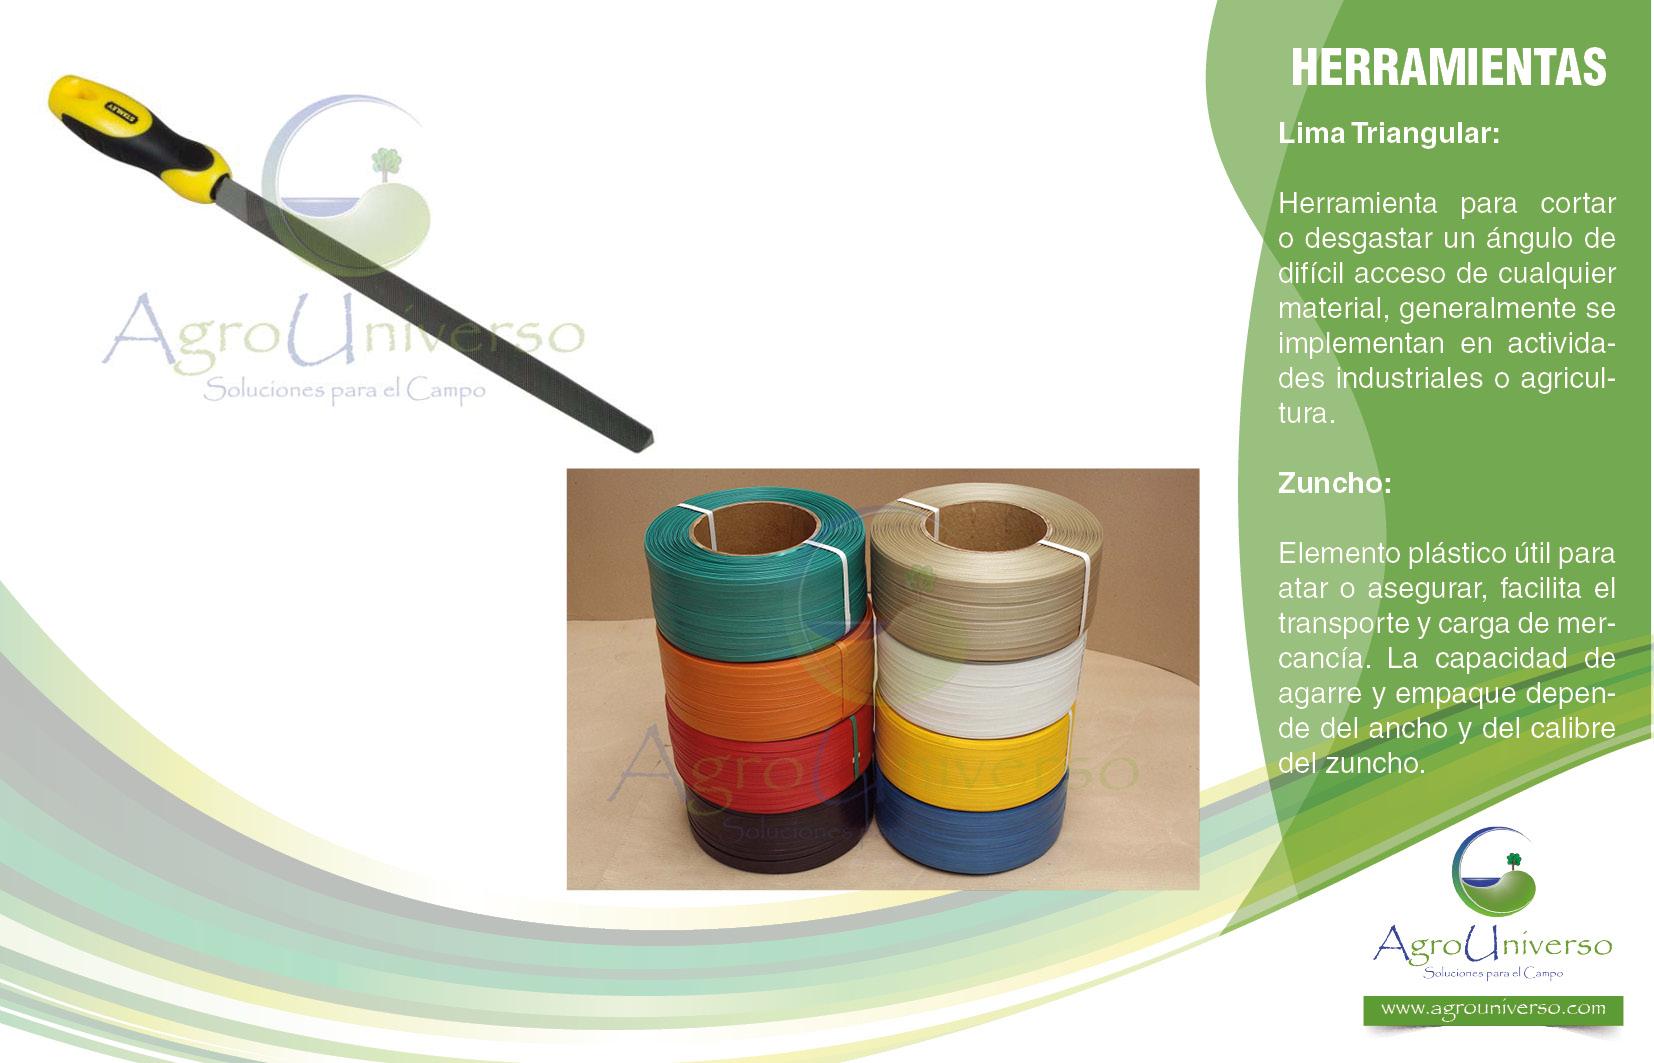 Catlogo-de-productos-Agrouniverso-33